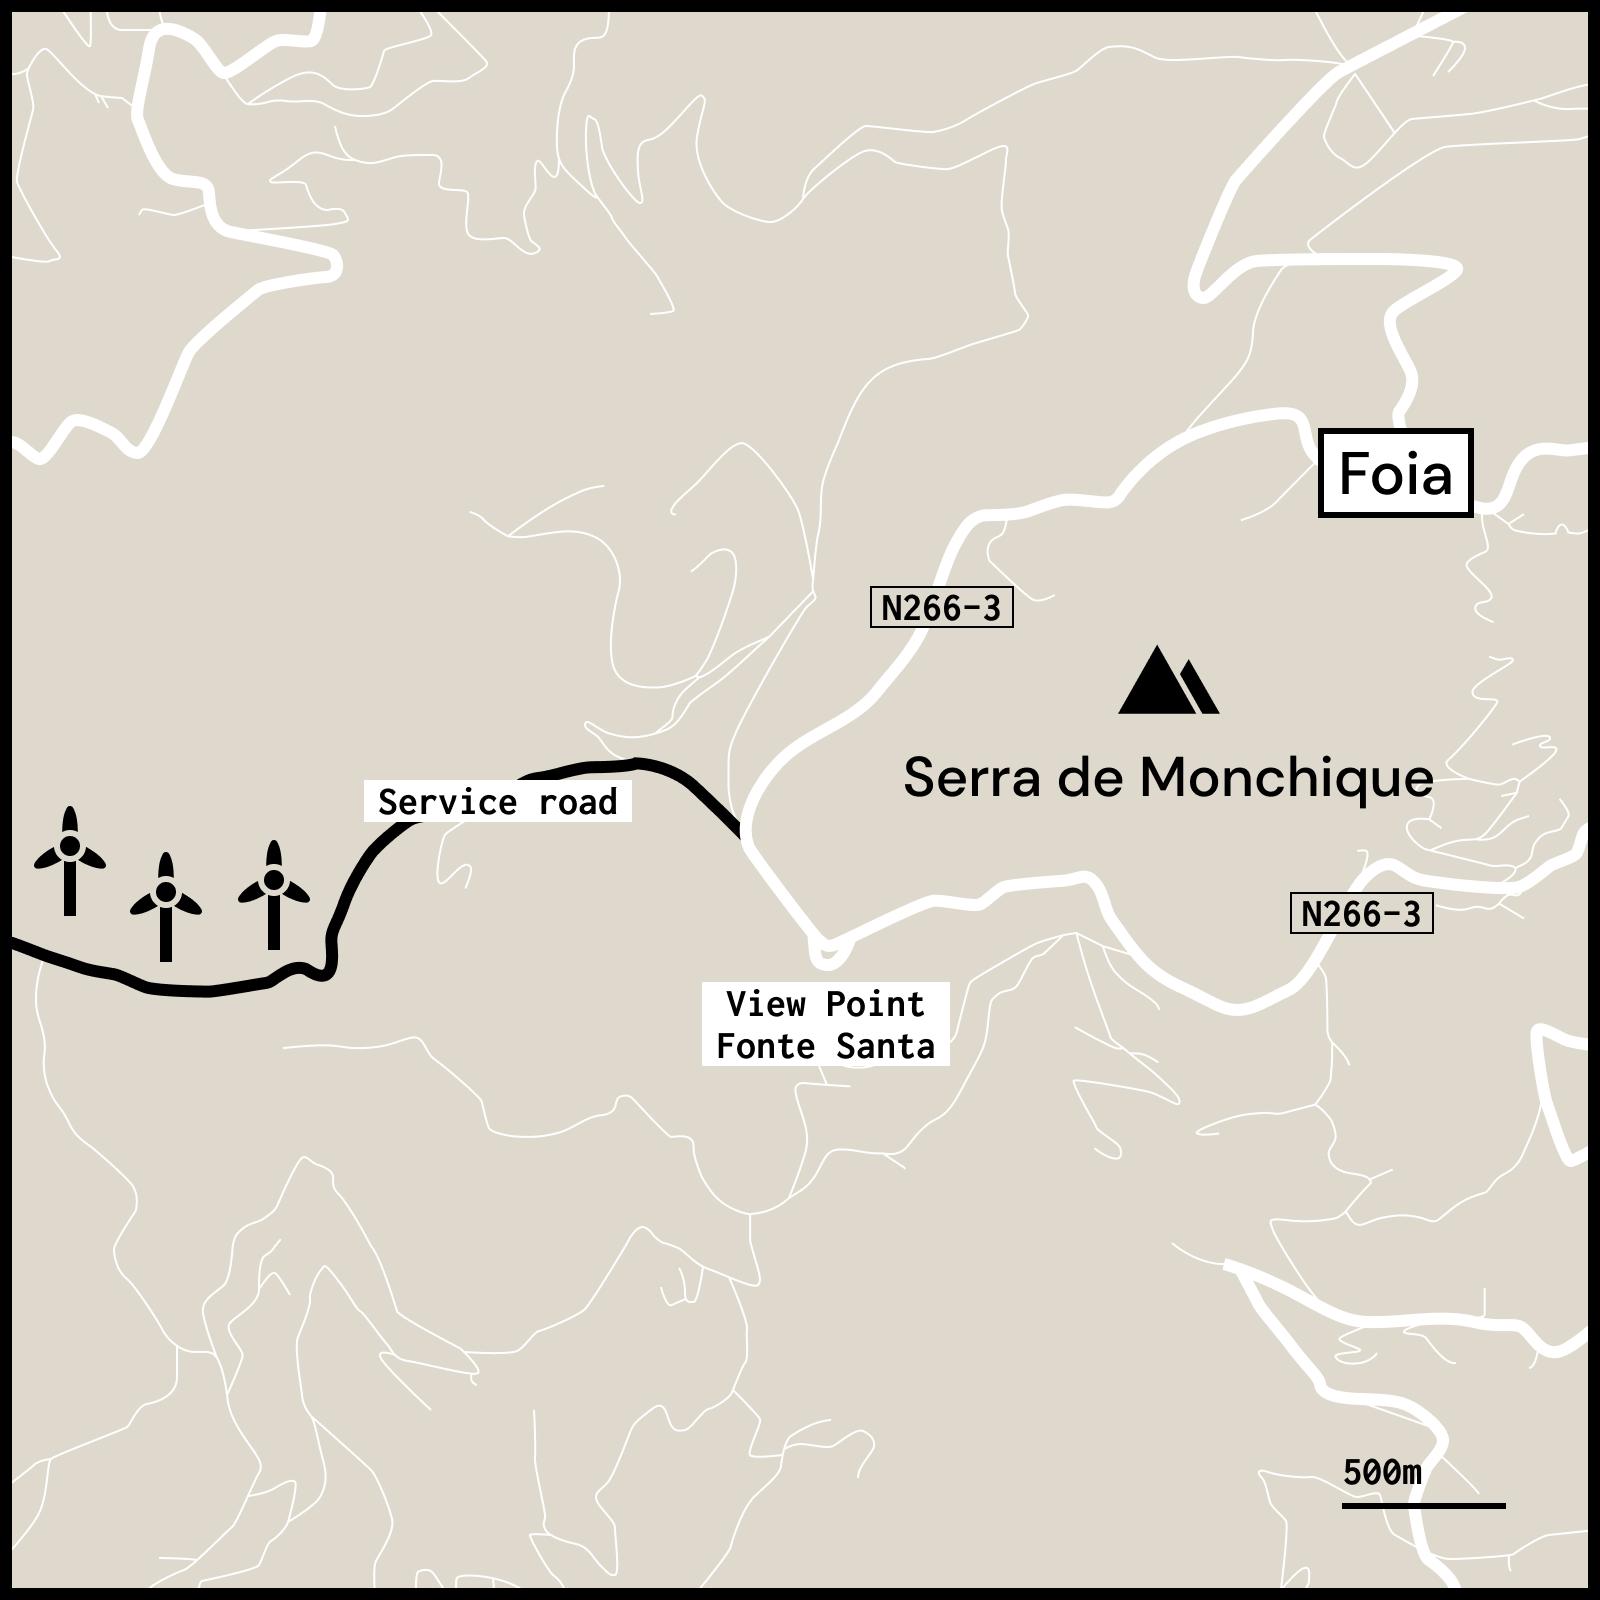 Map of Foia Monchique Algarve viewpoint Fonte Santa and service road